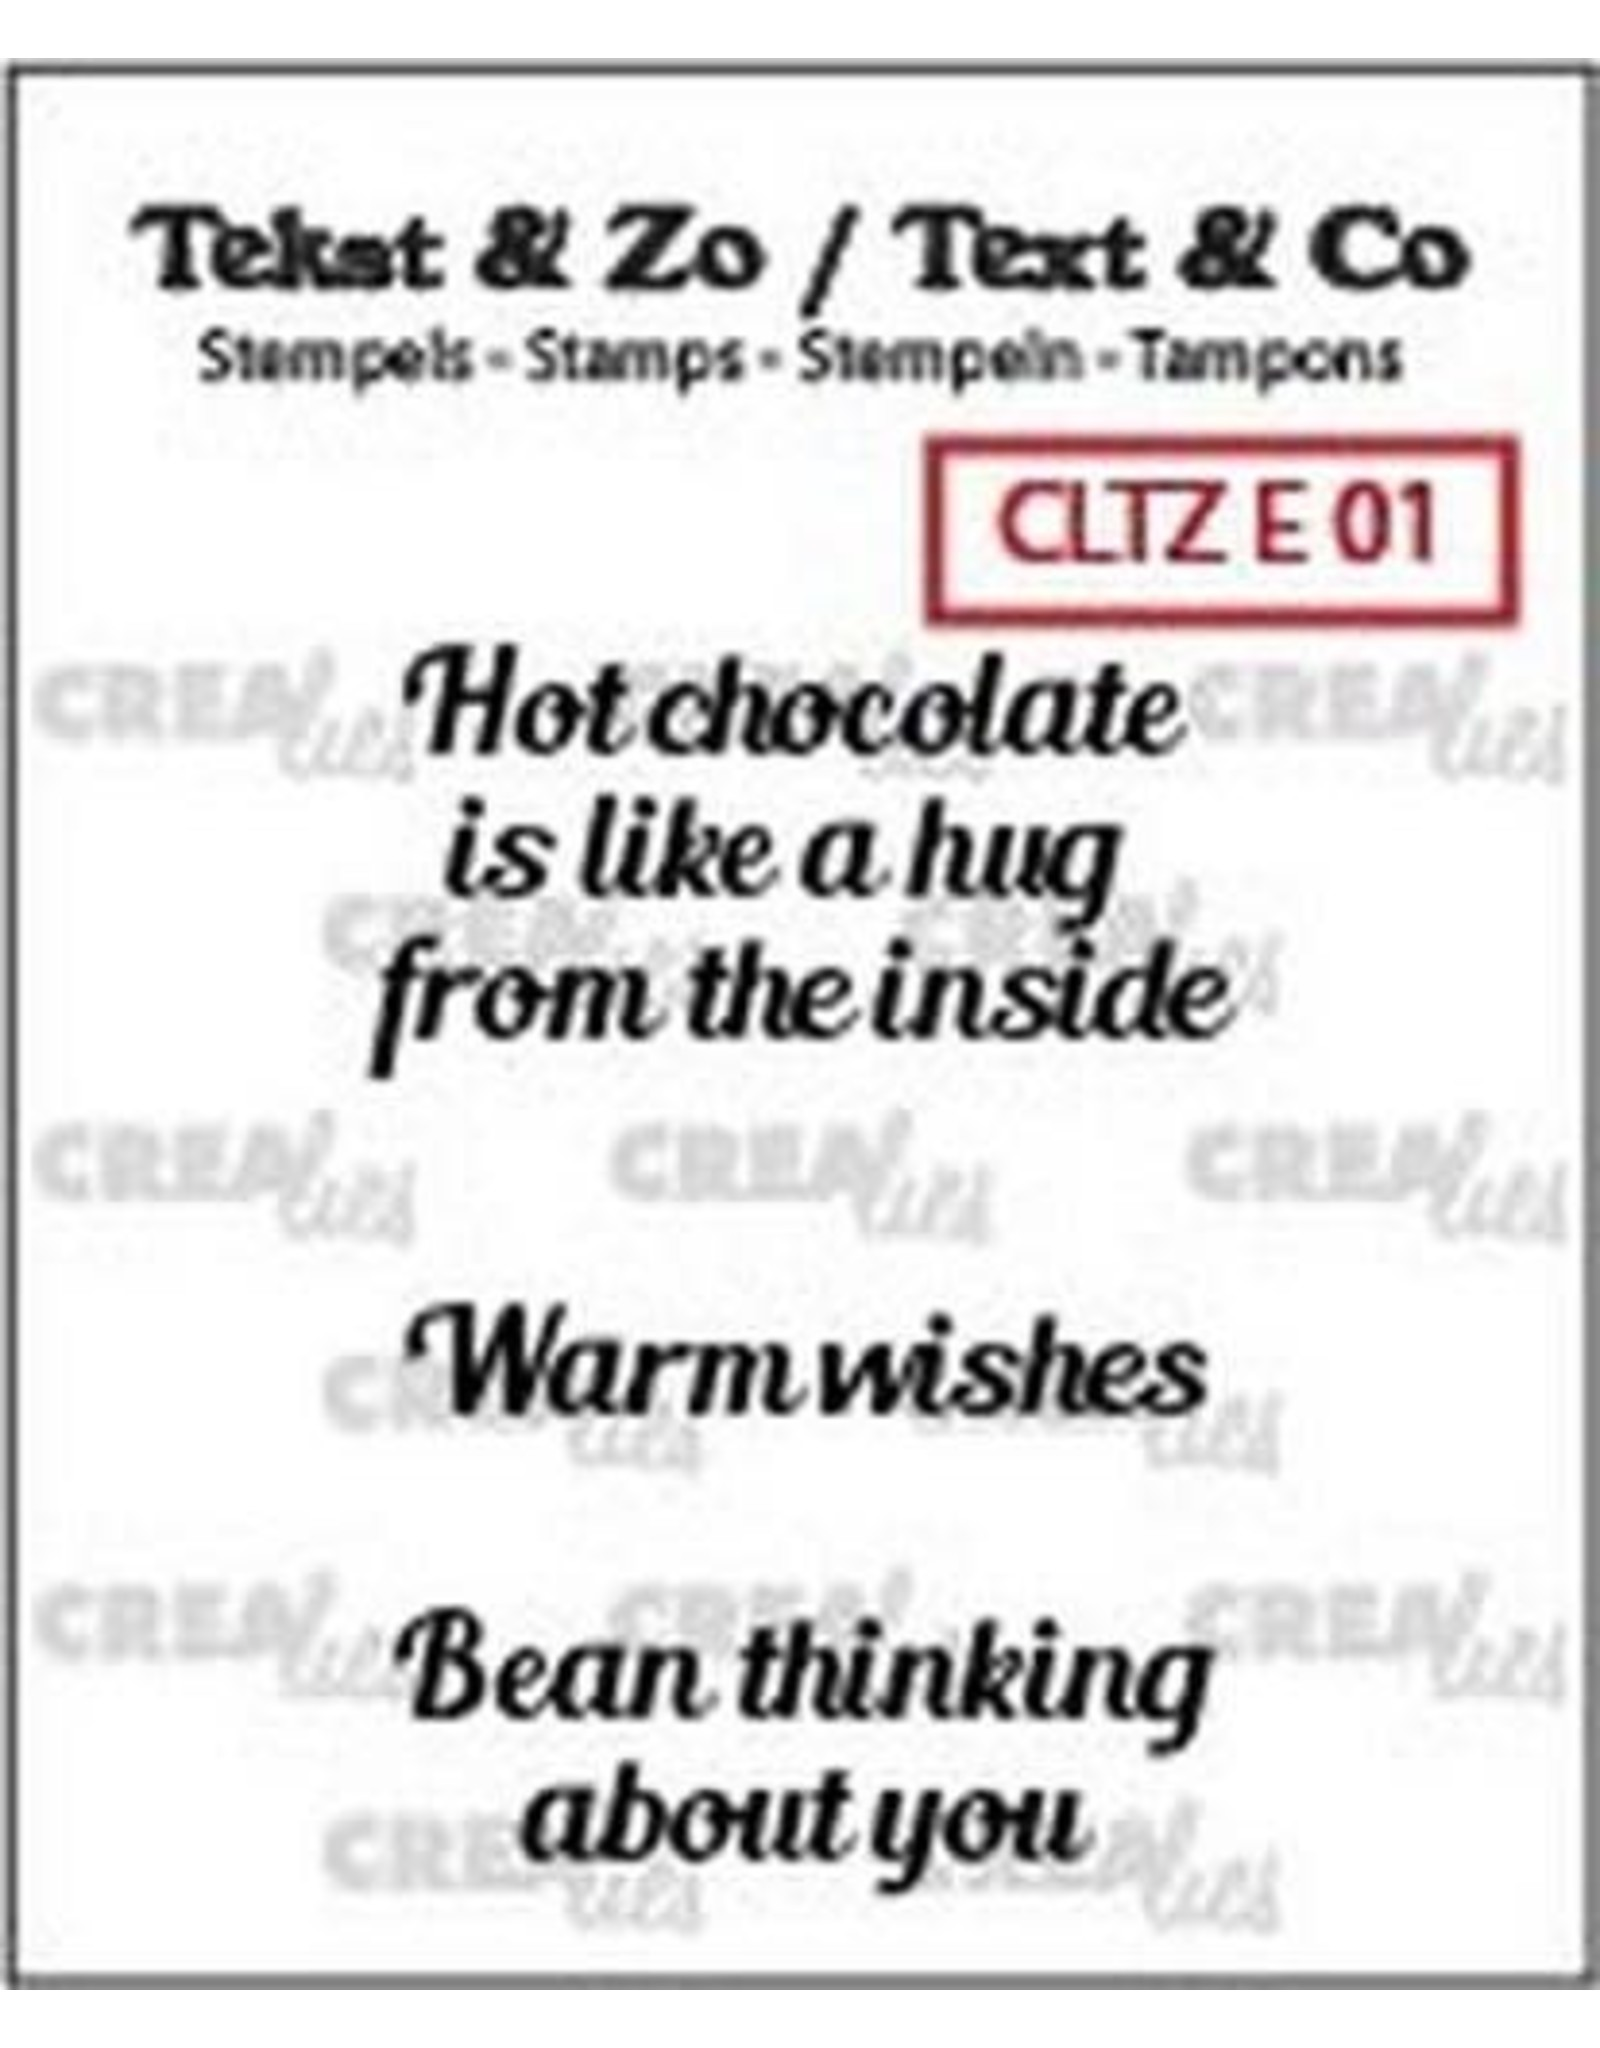 Crealies Clearstamp Tekst & Zo hot chocolate, warm wish(ENG) CLTZE01